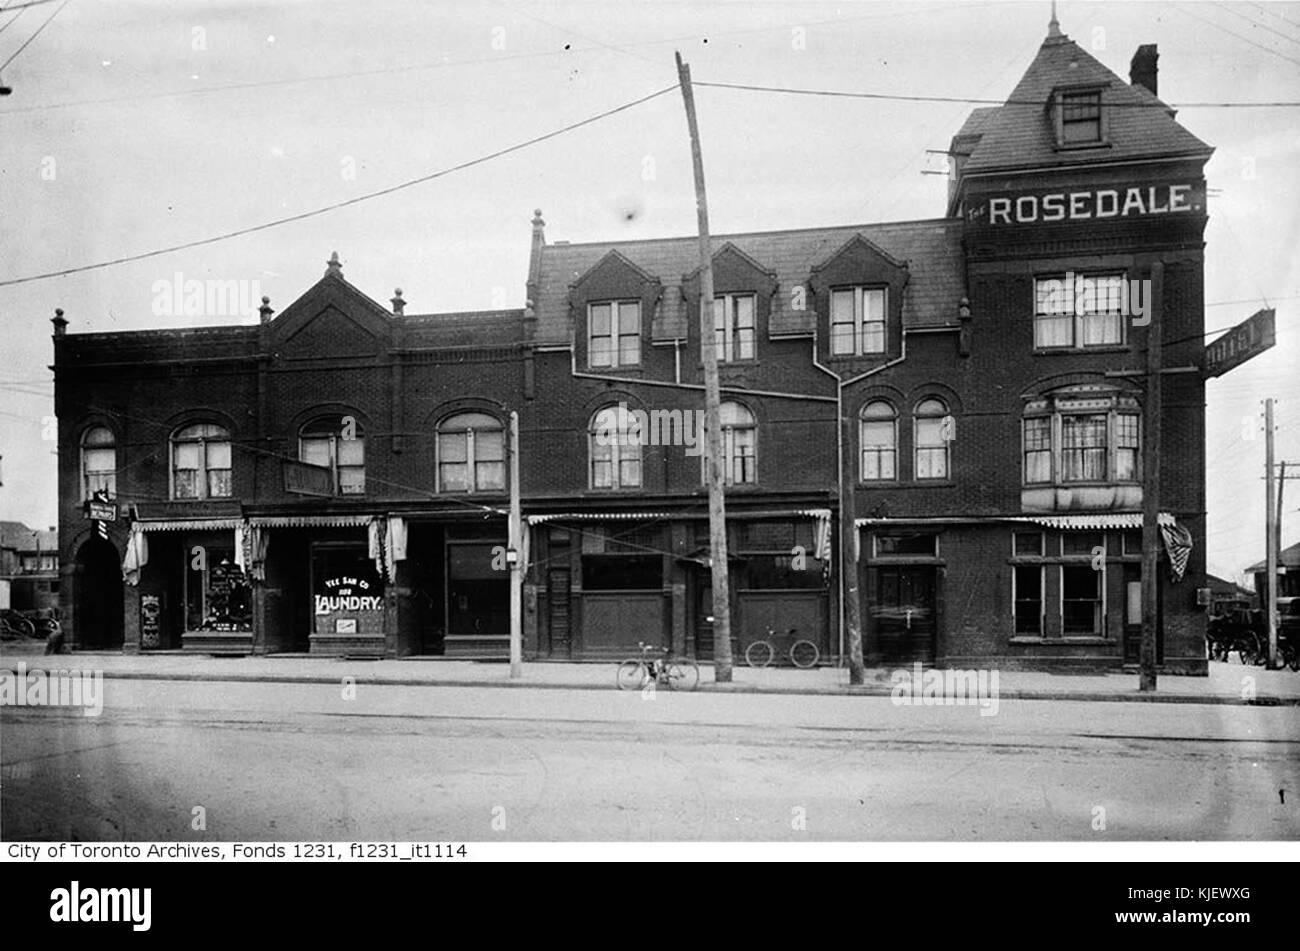 Northeast corner of Yonge Street and Shaftesbury Avenue, Rosedale Hotel (4504056583) - Stock Image